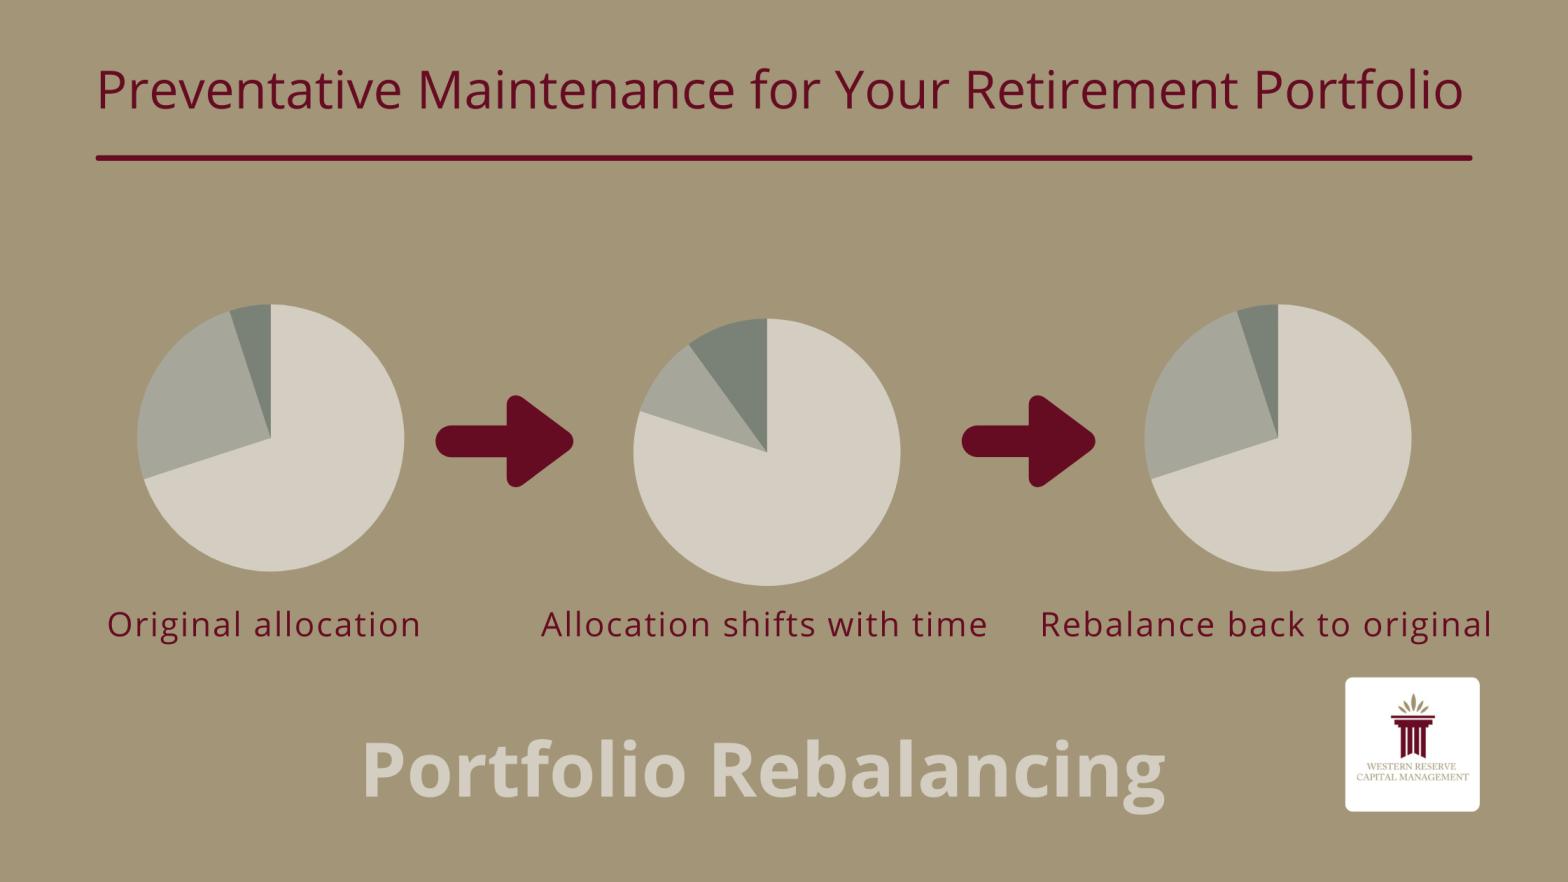 Preventative Maintenance for Your Retirement Portfolio